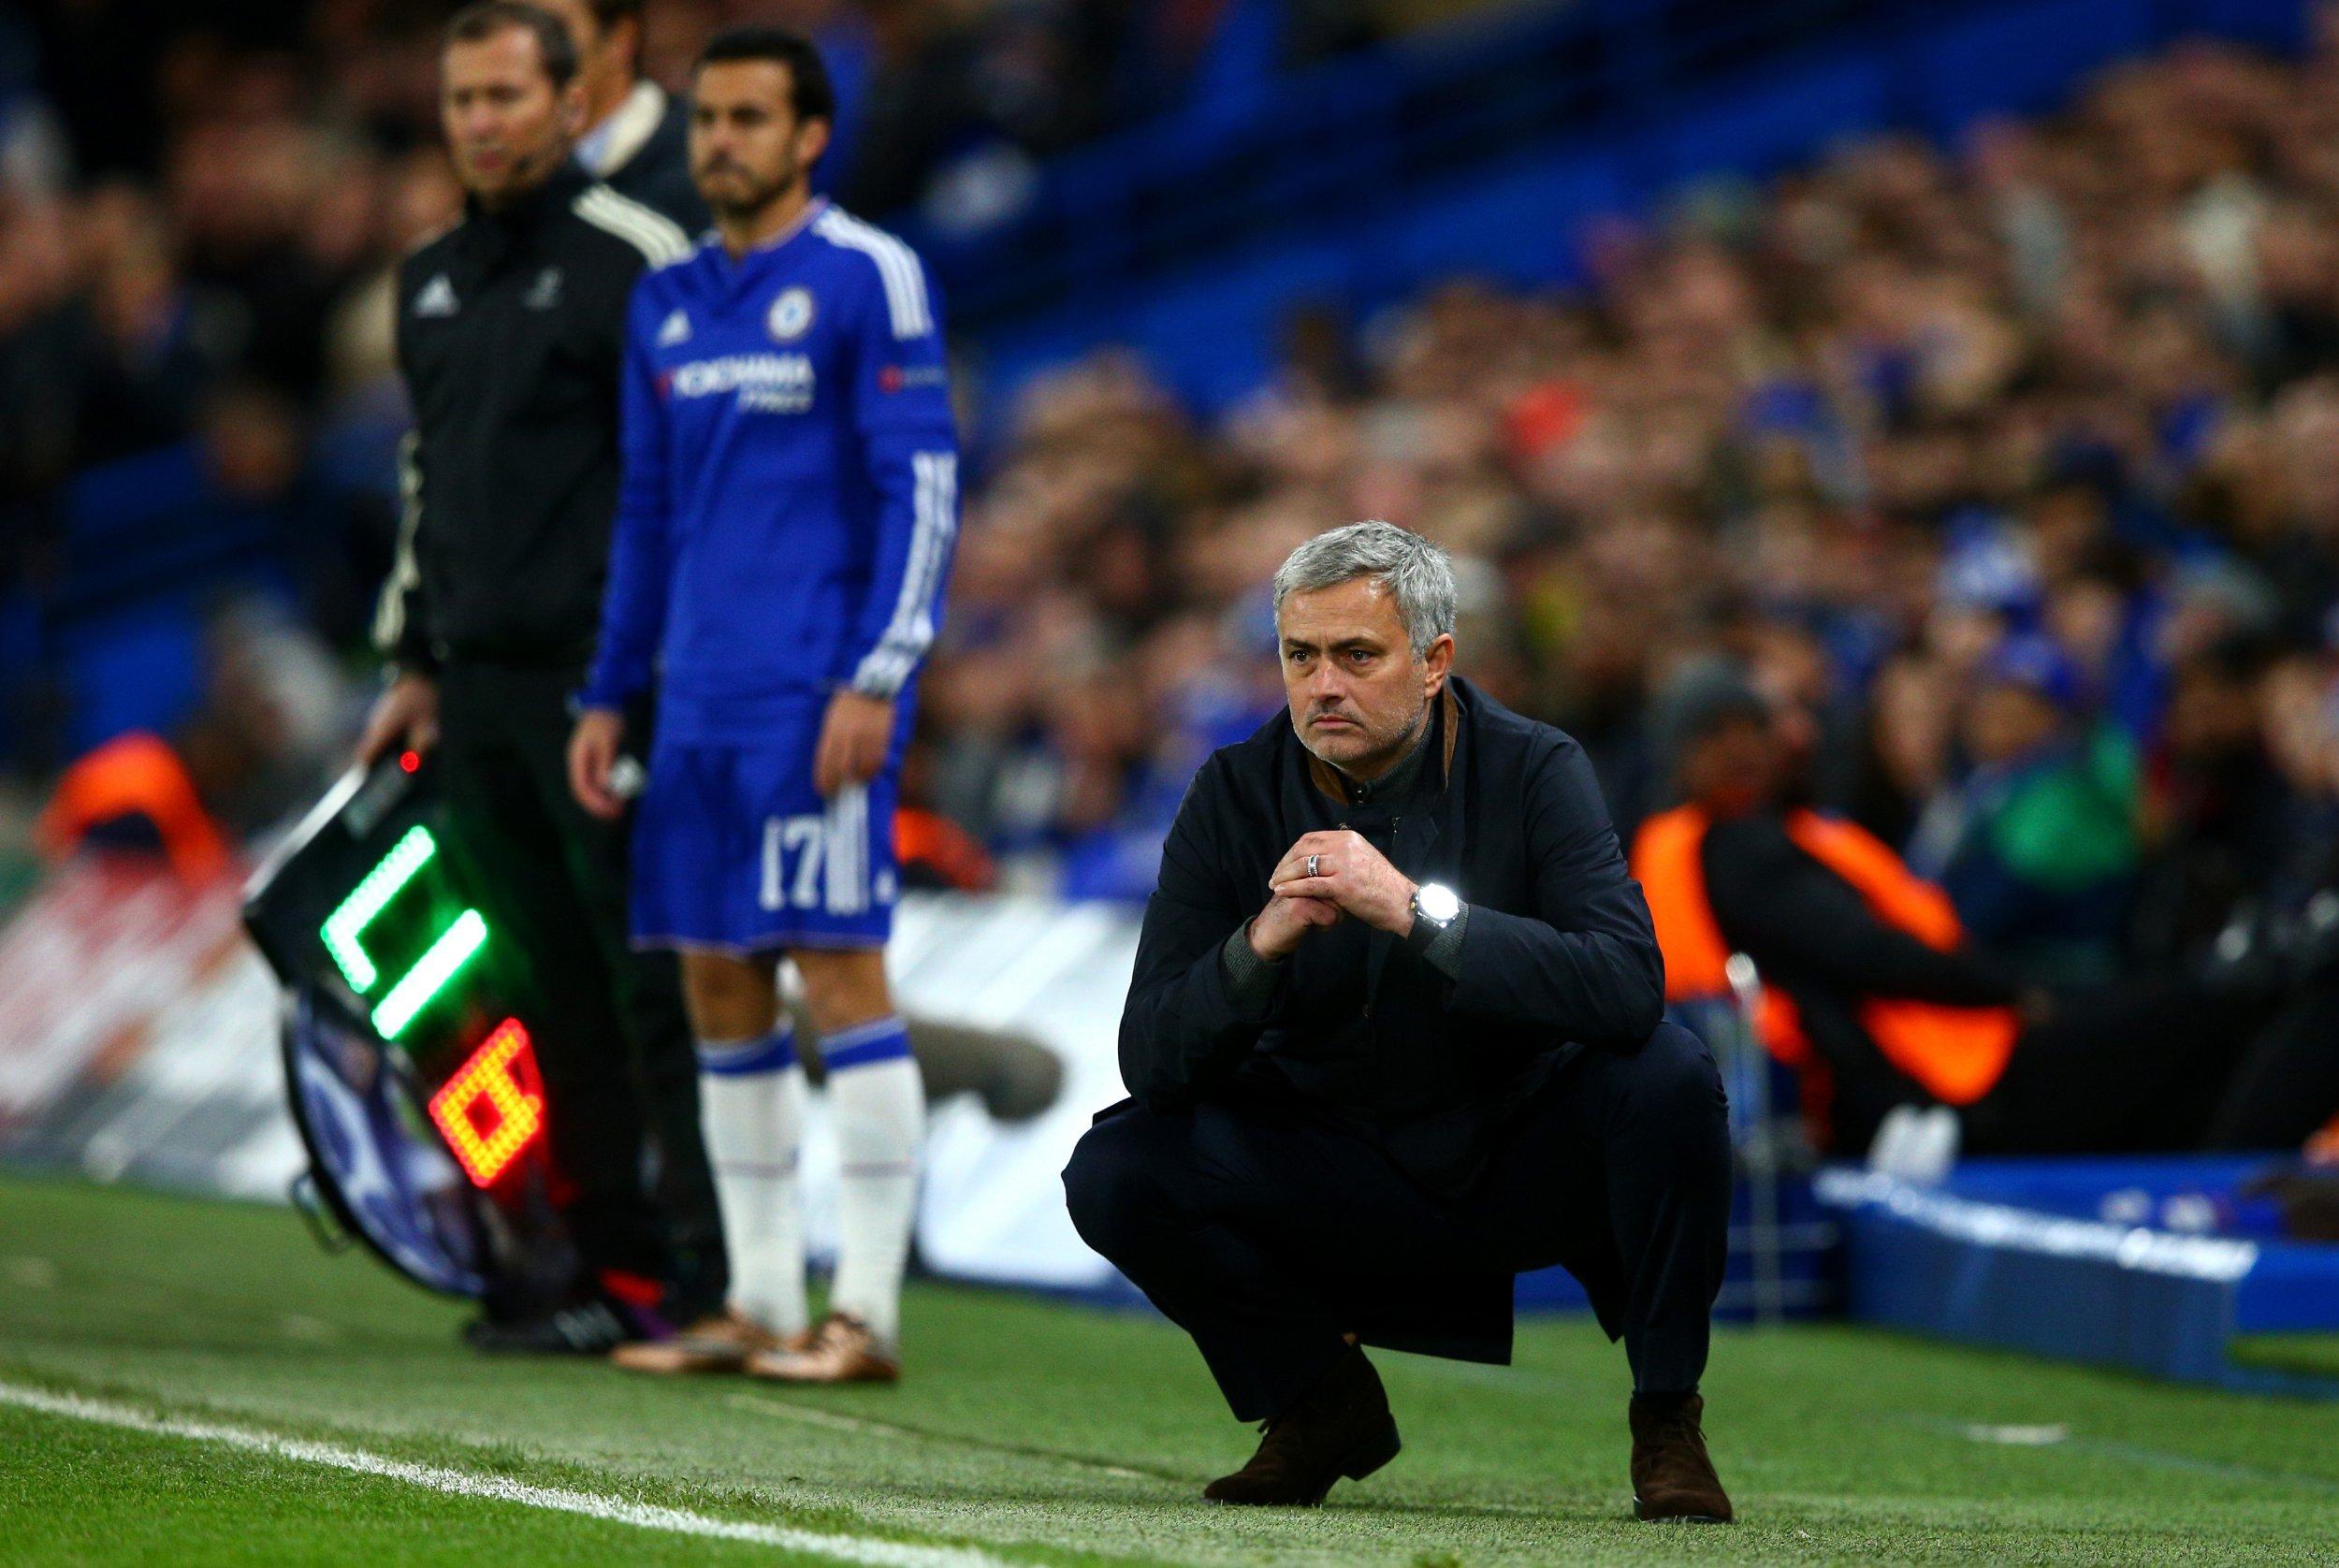 Jose Mourinho, former Chelsea manager.